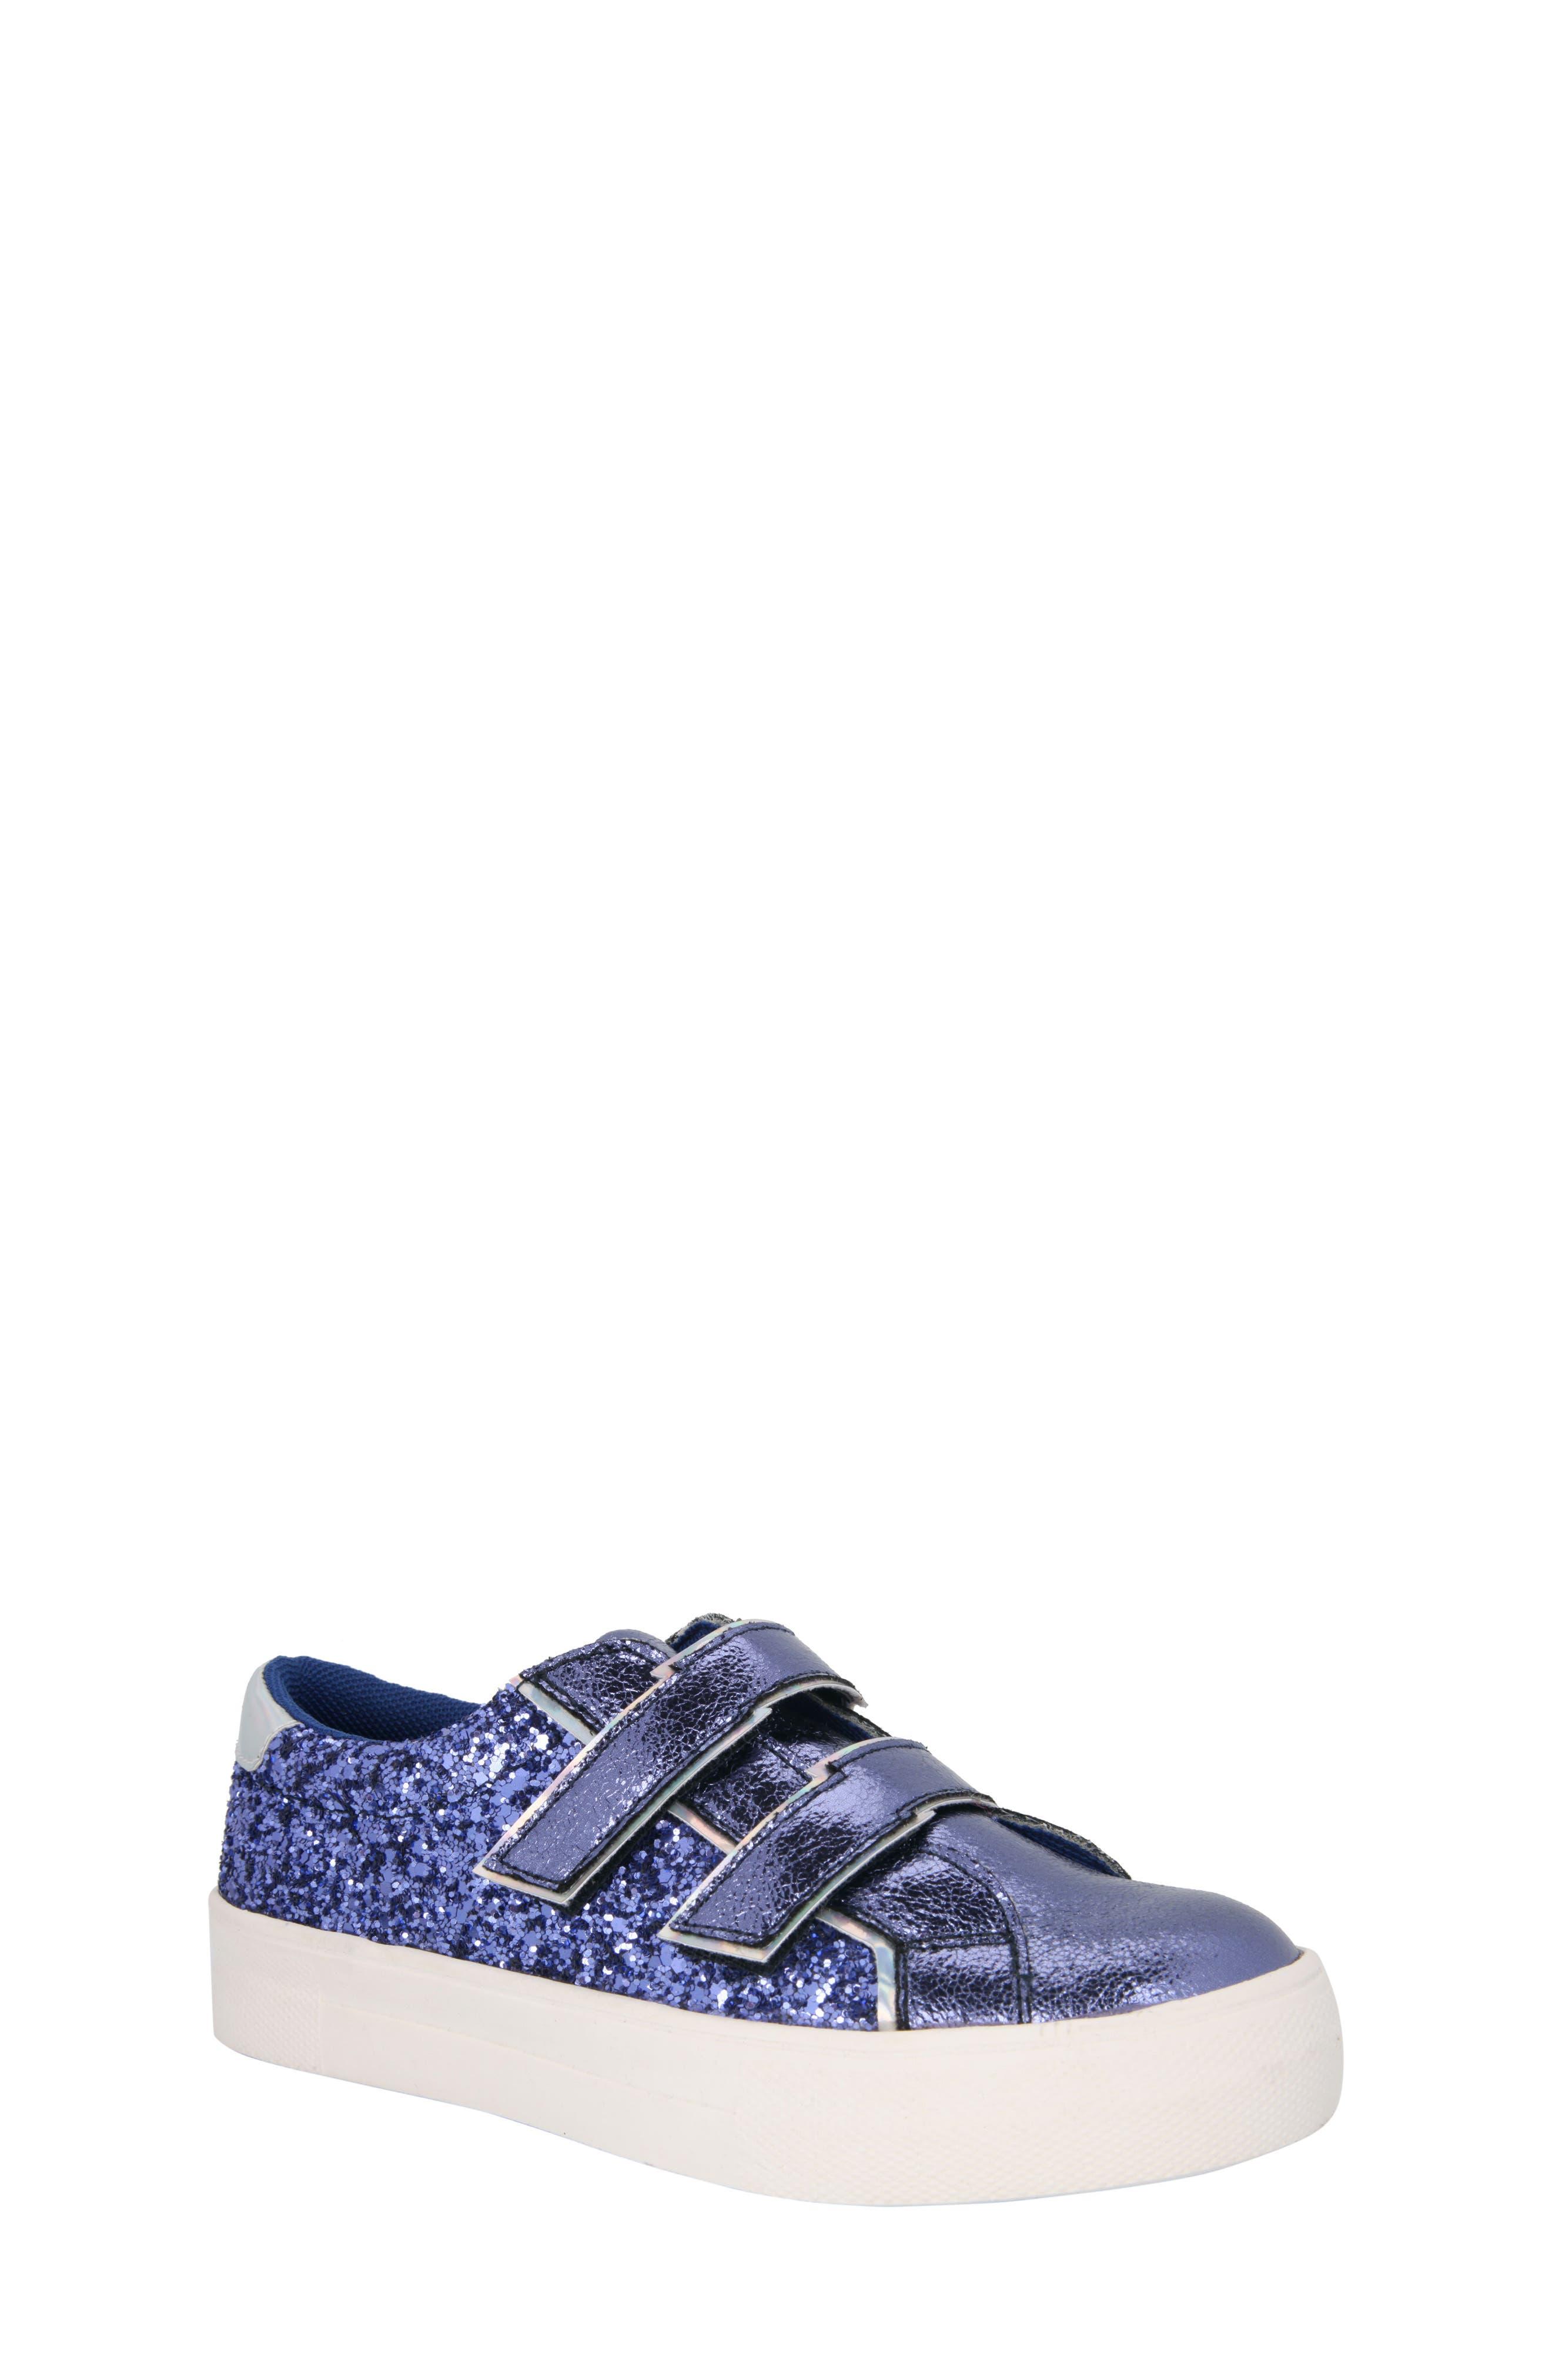 Ashley Glittery Metallic Sneaker,                             Main thumbnail 1, color,                             Cobalt Metallic/ Glitter